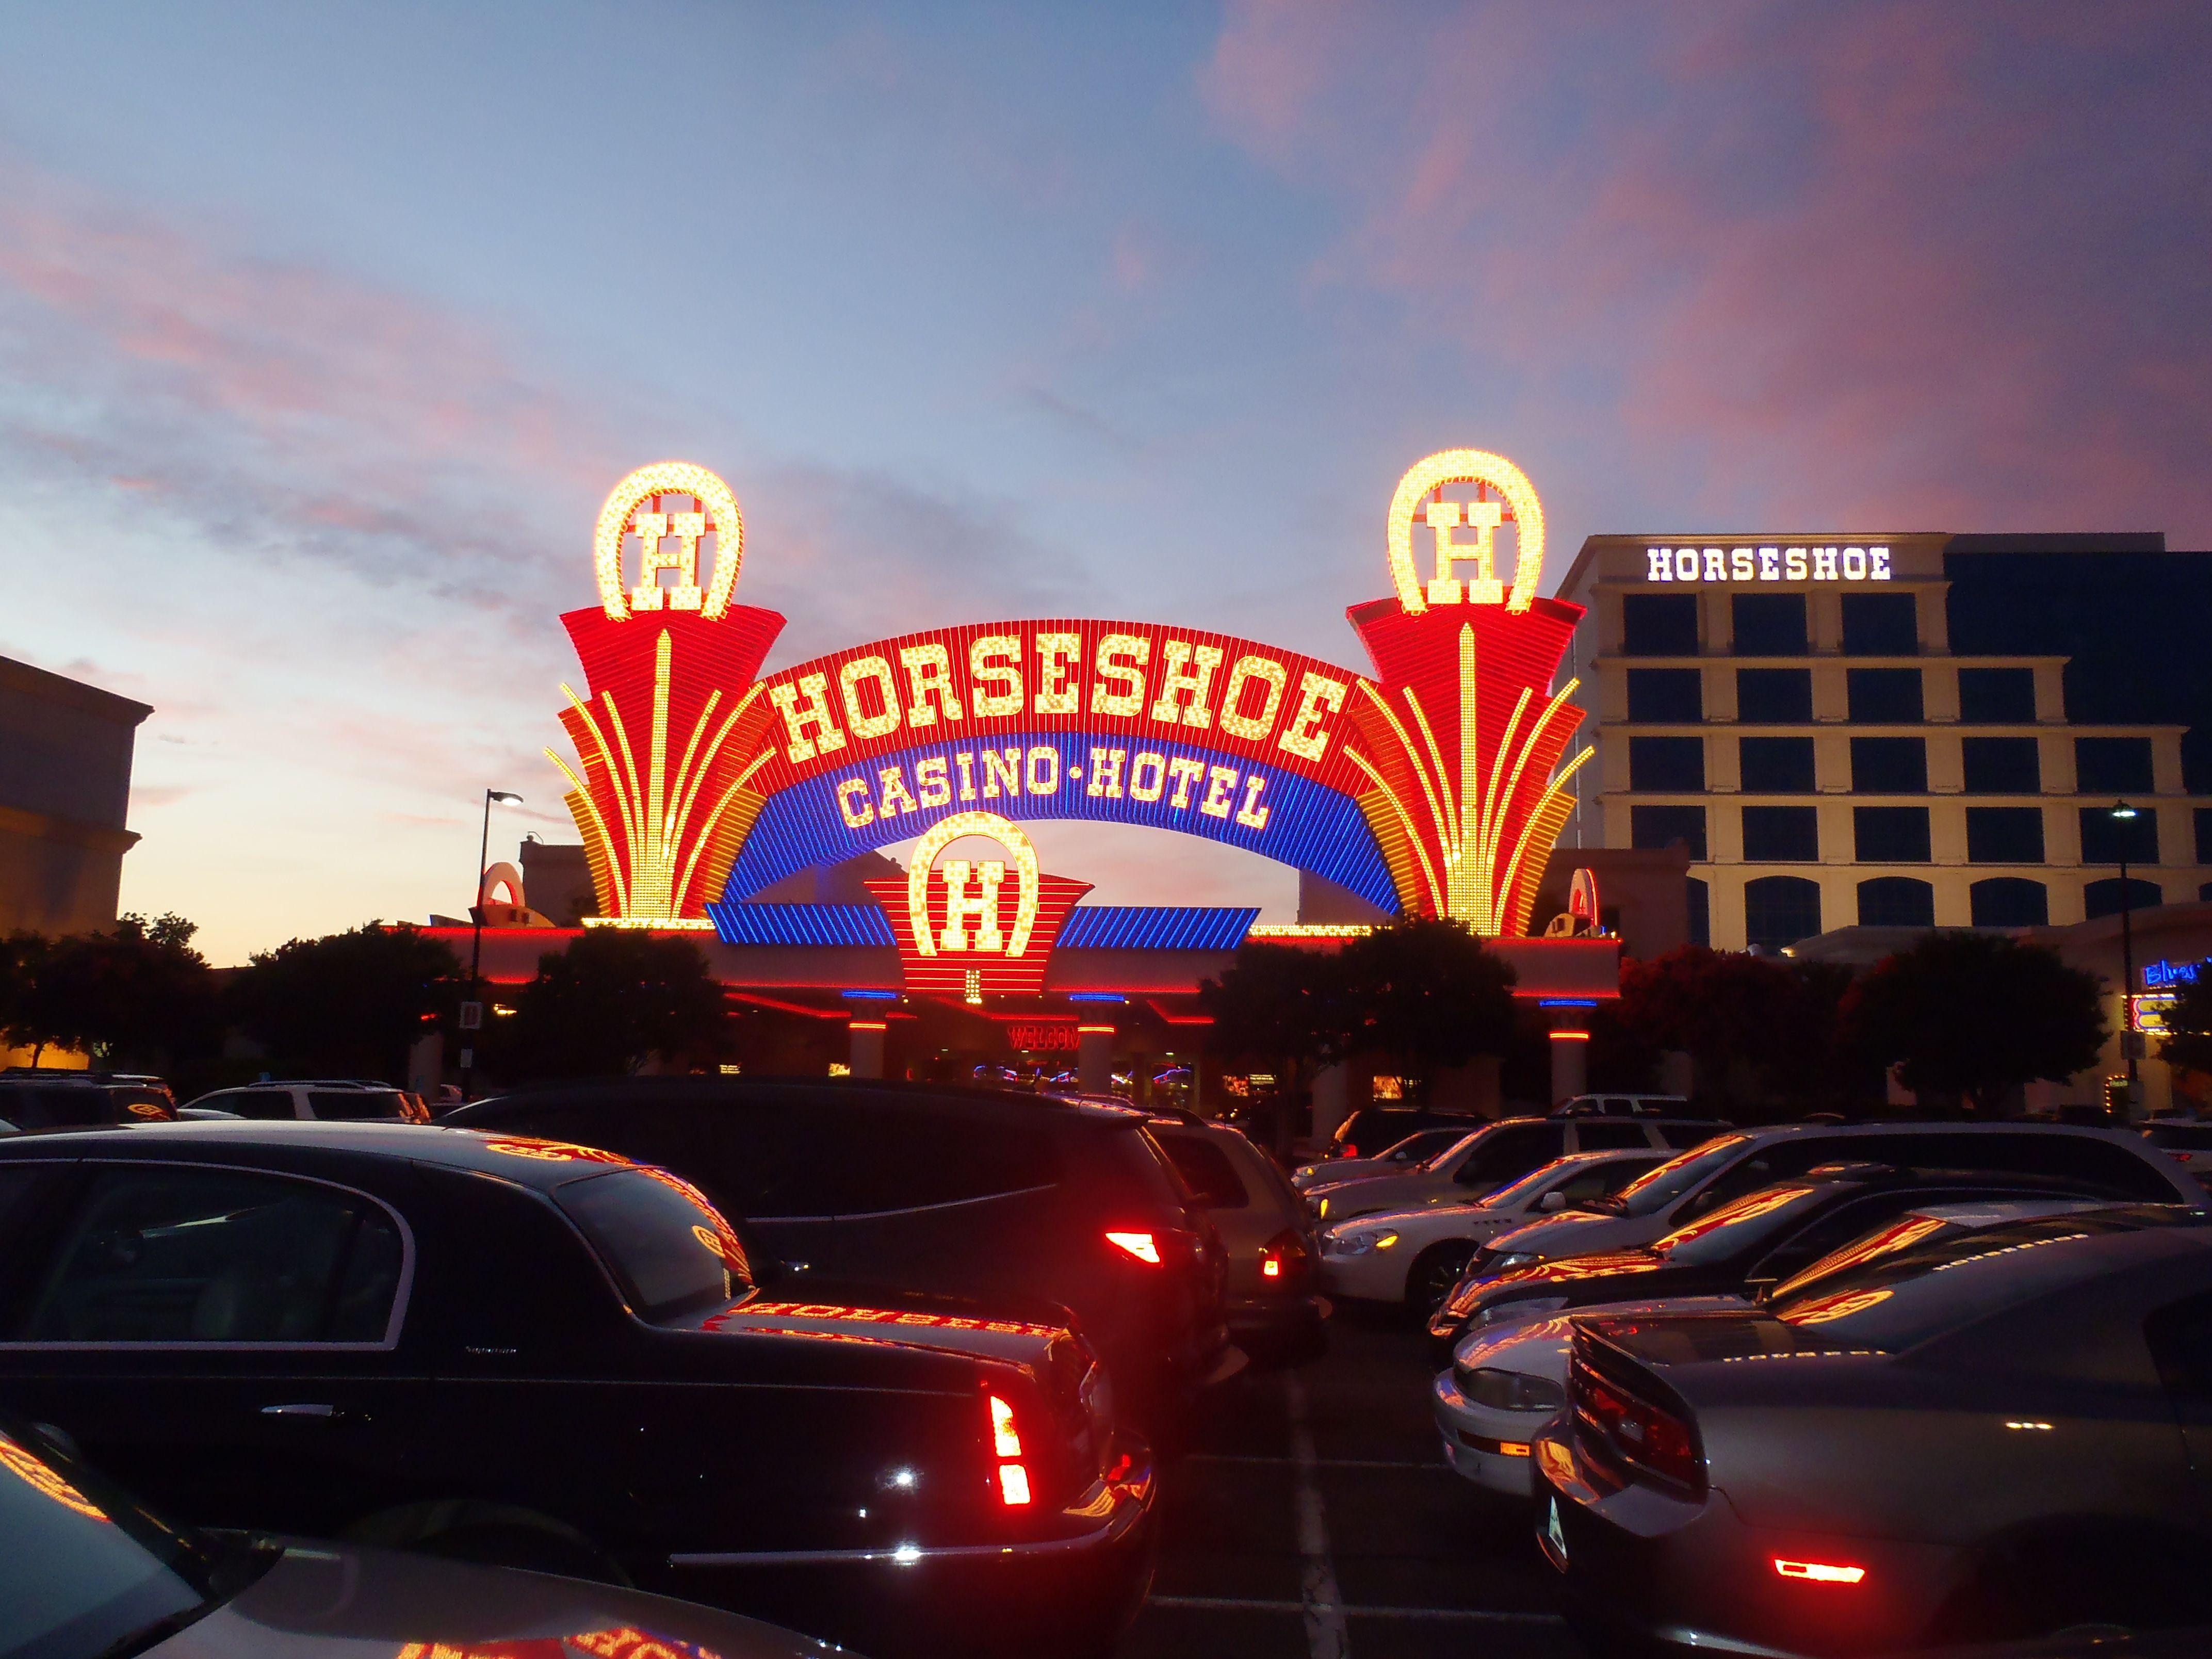 Horseshoe casino in Tunica Mississippi. Tunica casinos